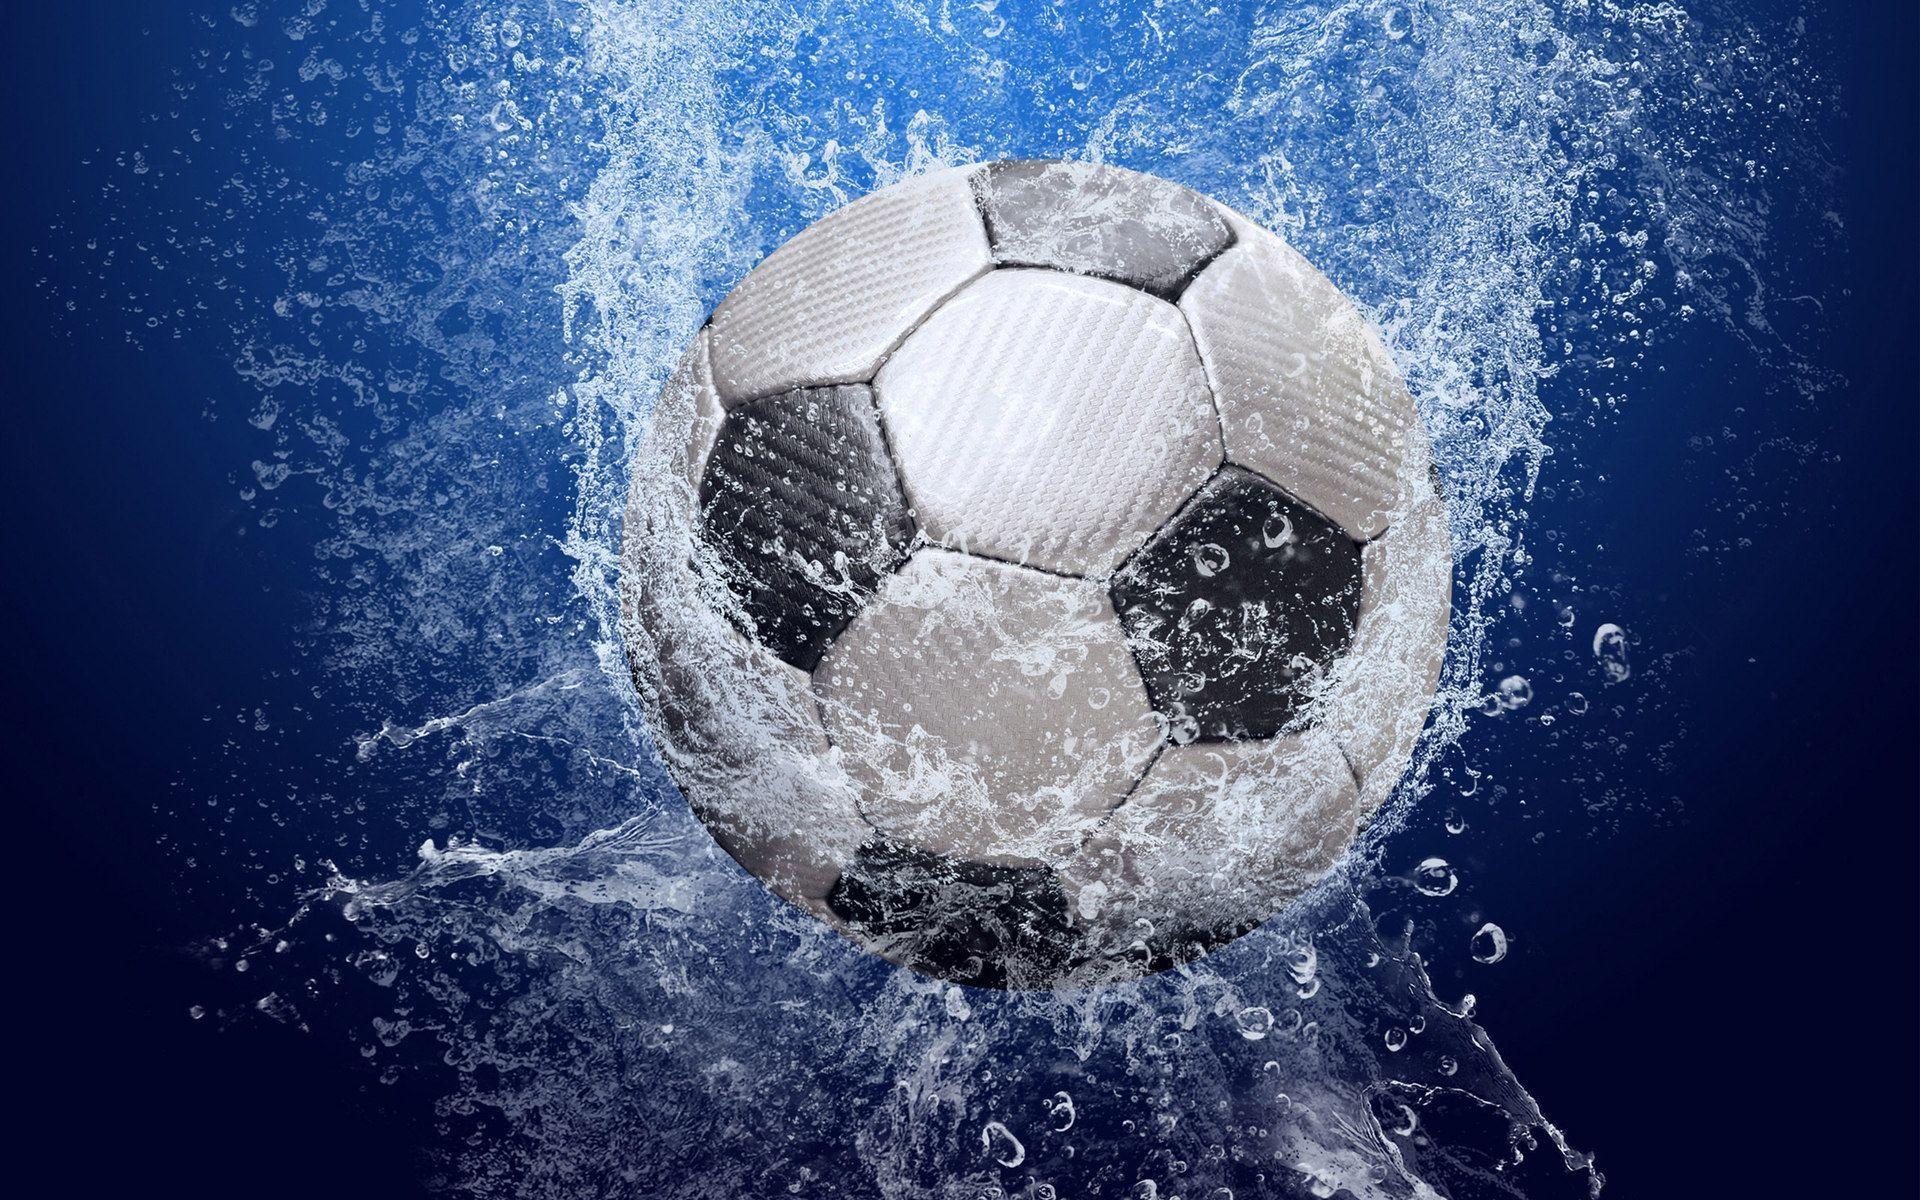 soccer wallpaper, soccer ball wallpaper